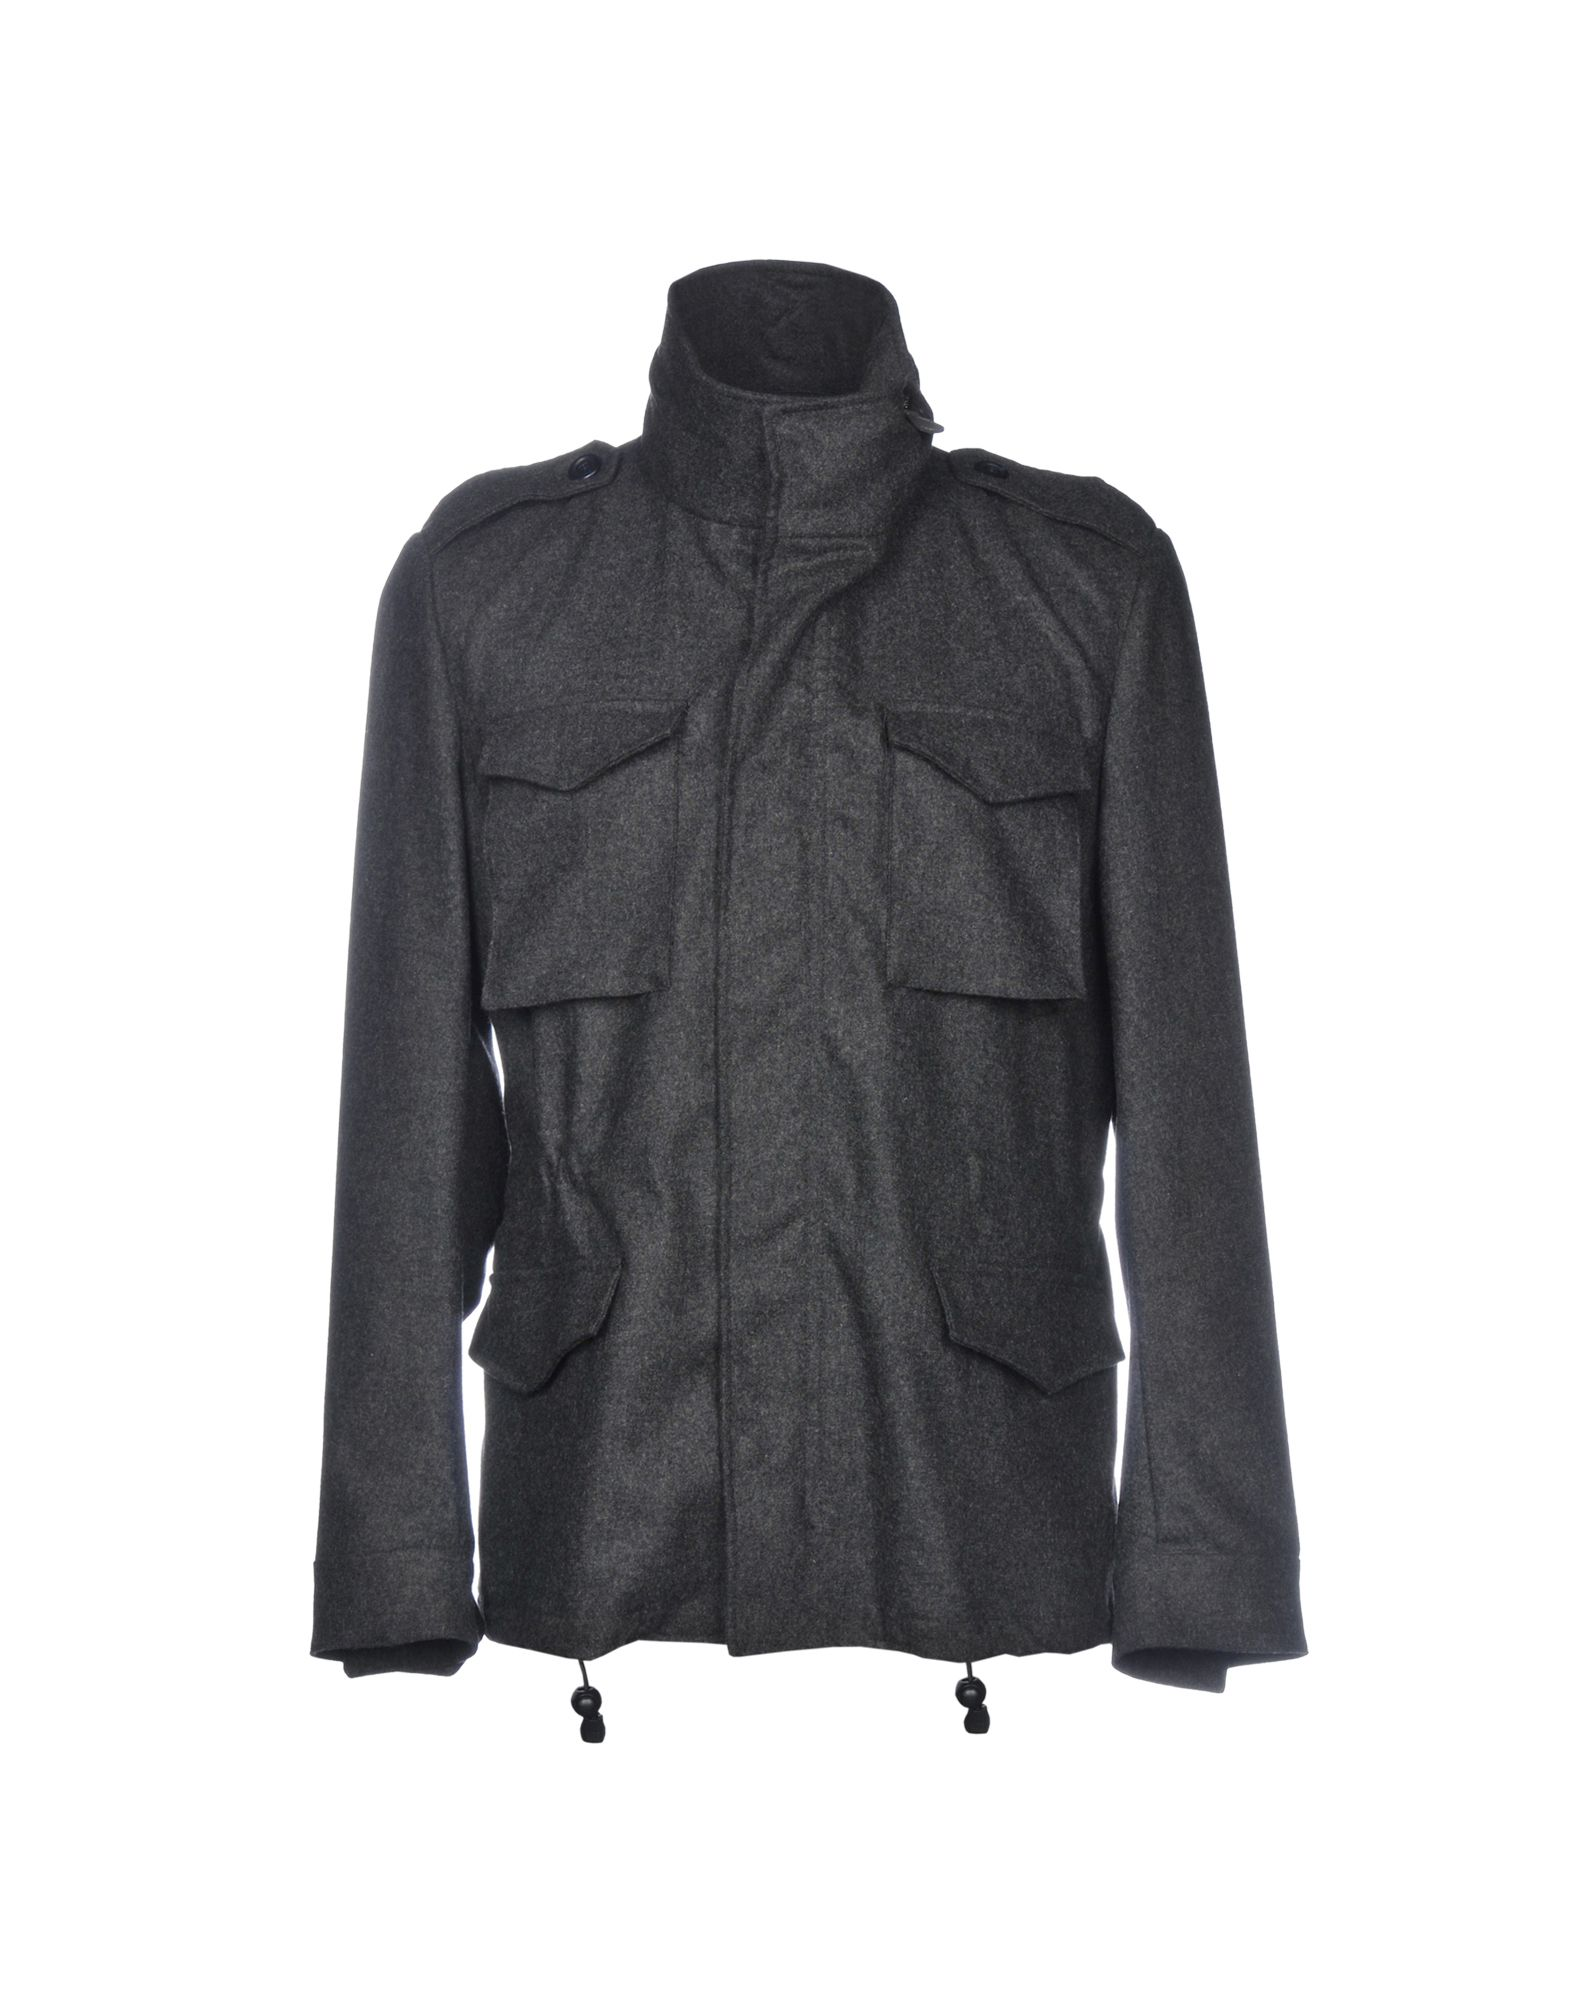 CRUNA Jacket in Steel Grey